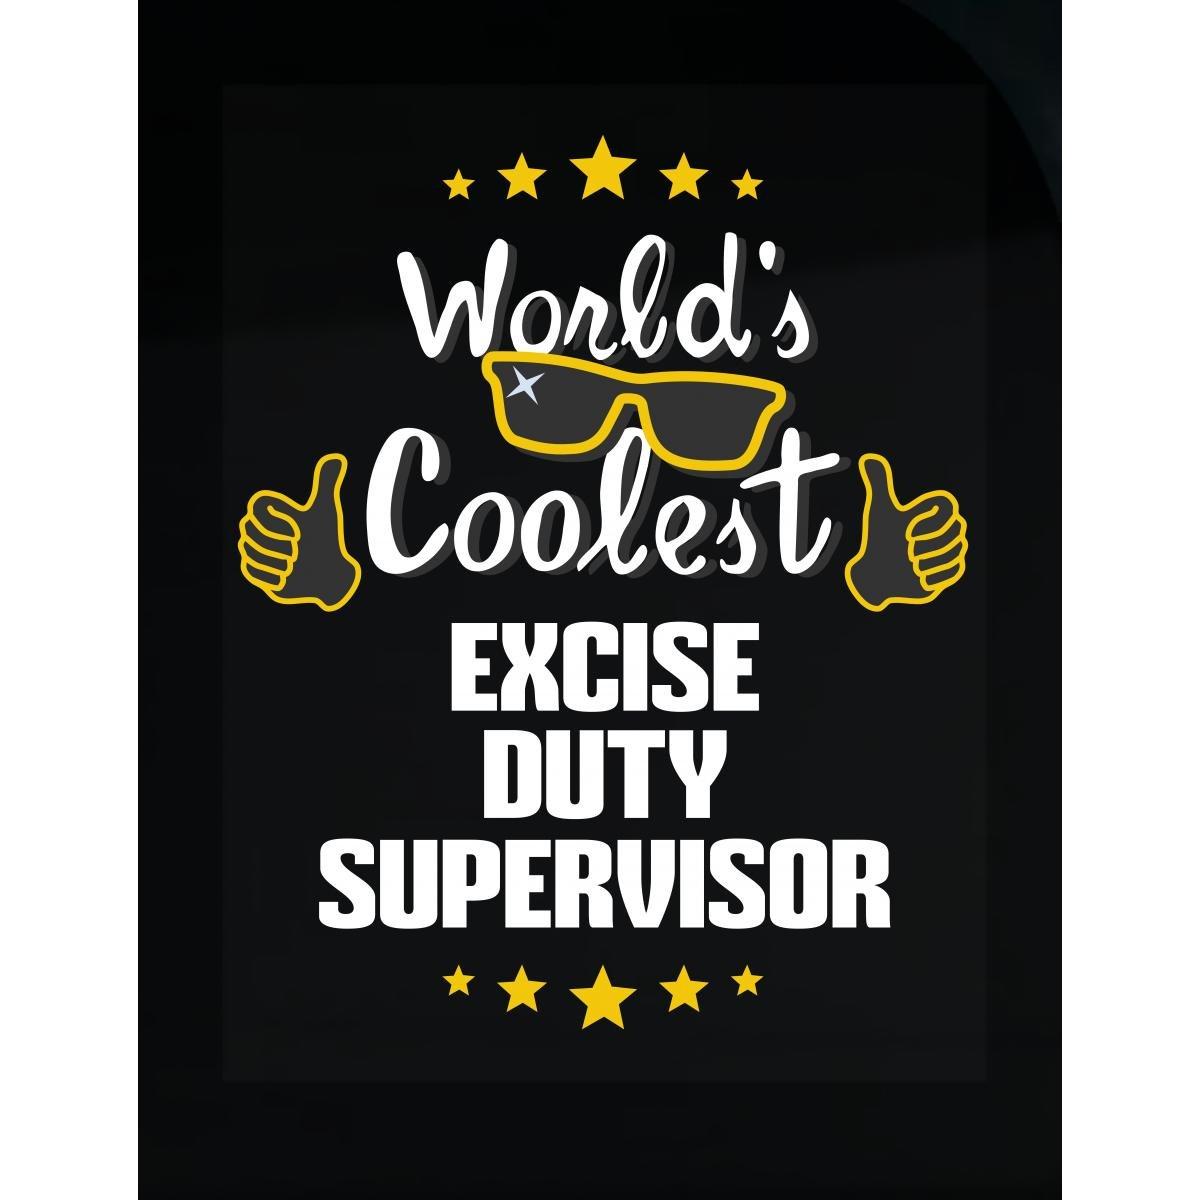 World's Coolest Excise Duty Supervisor - Sticker